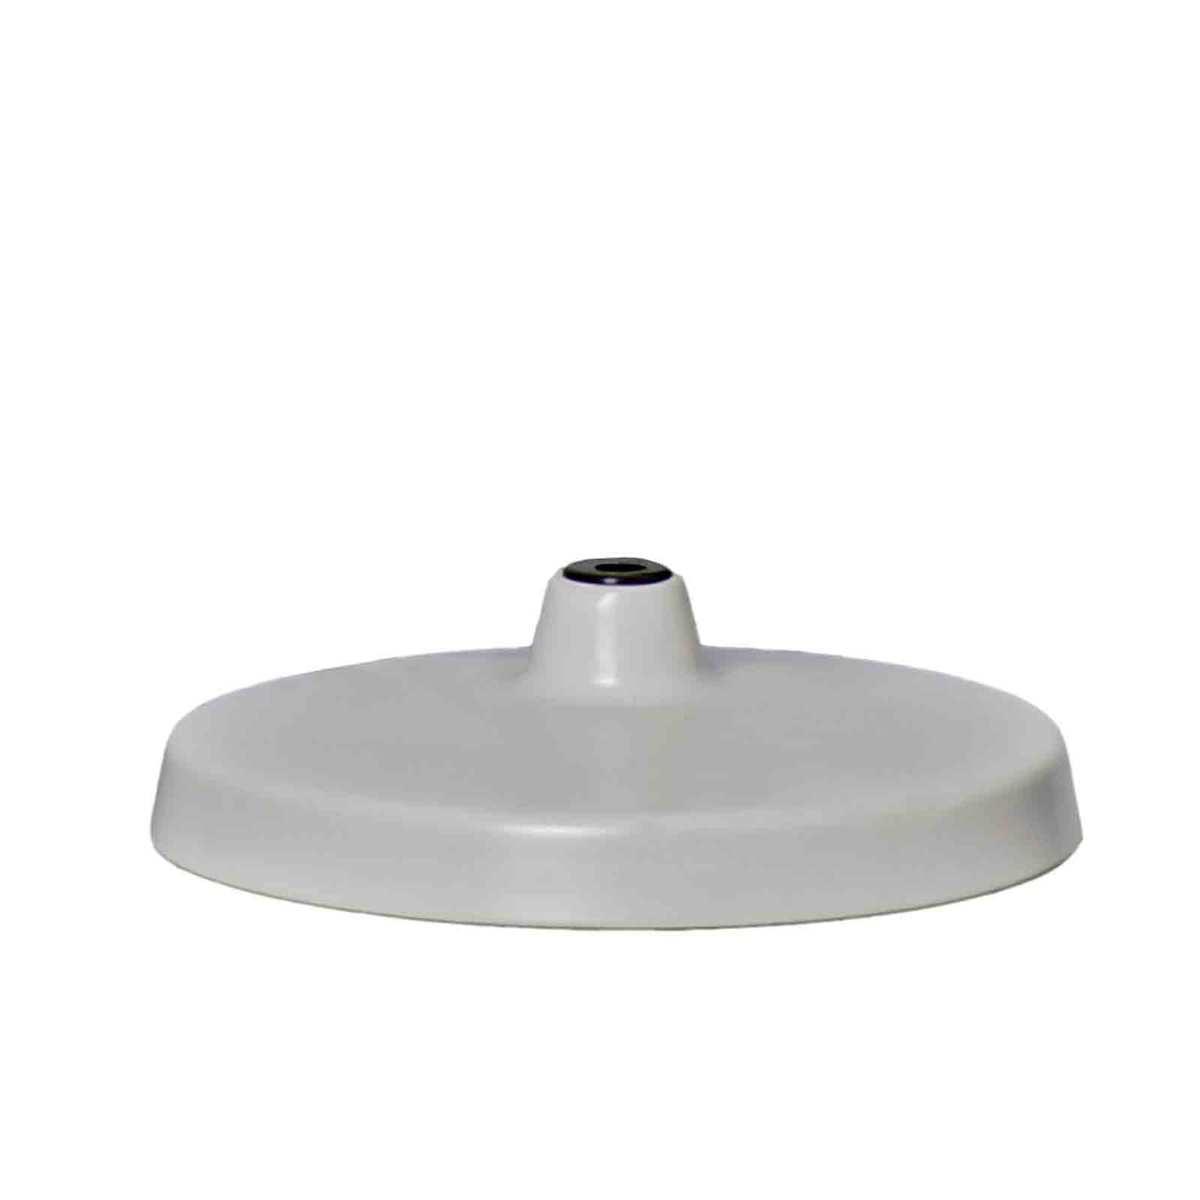 Luxo L 1 Lamp Base White Finnish Design Shop